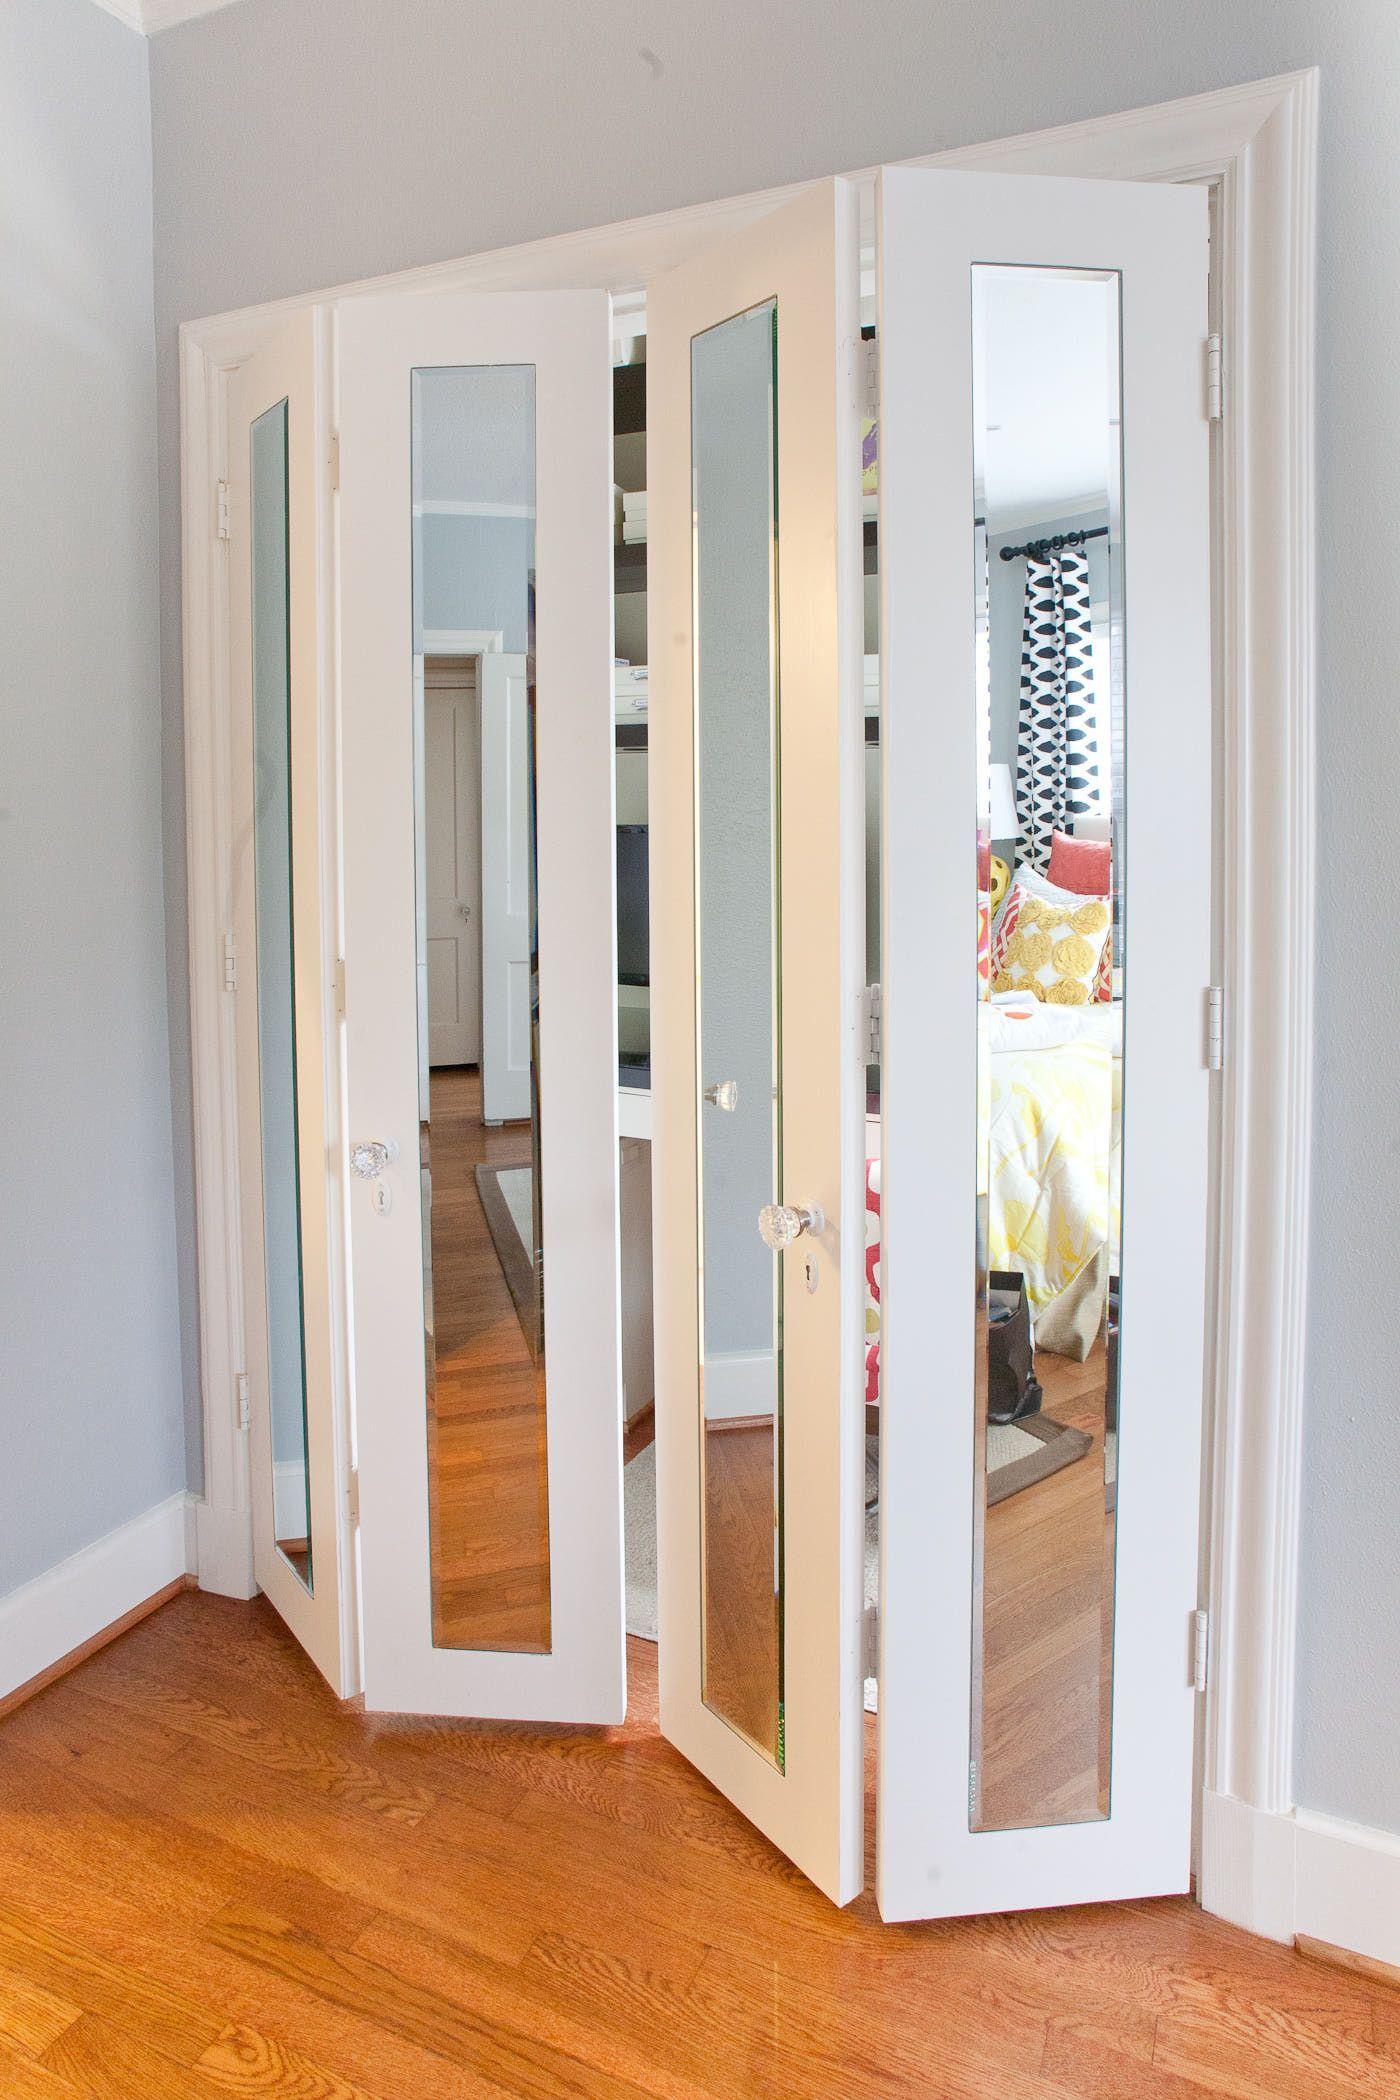 Especial wood mirrored sliding closet doors on brown